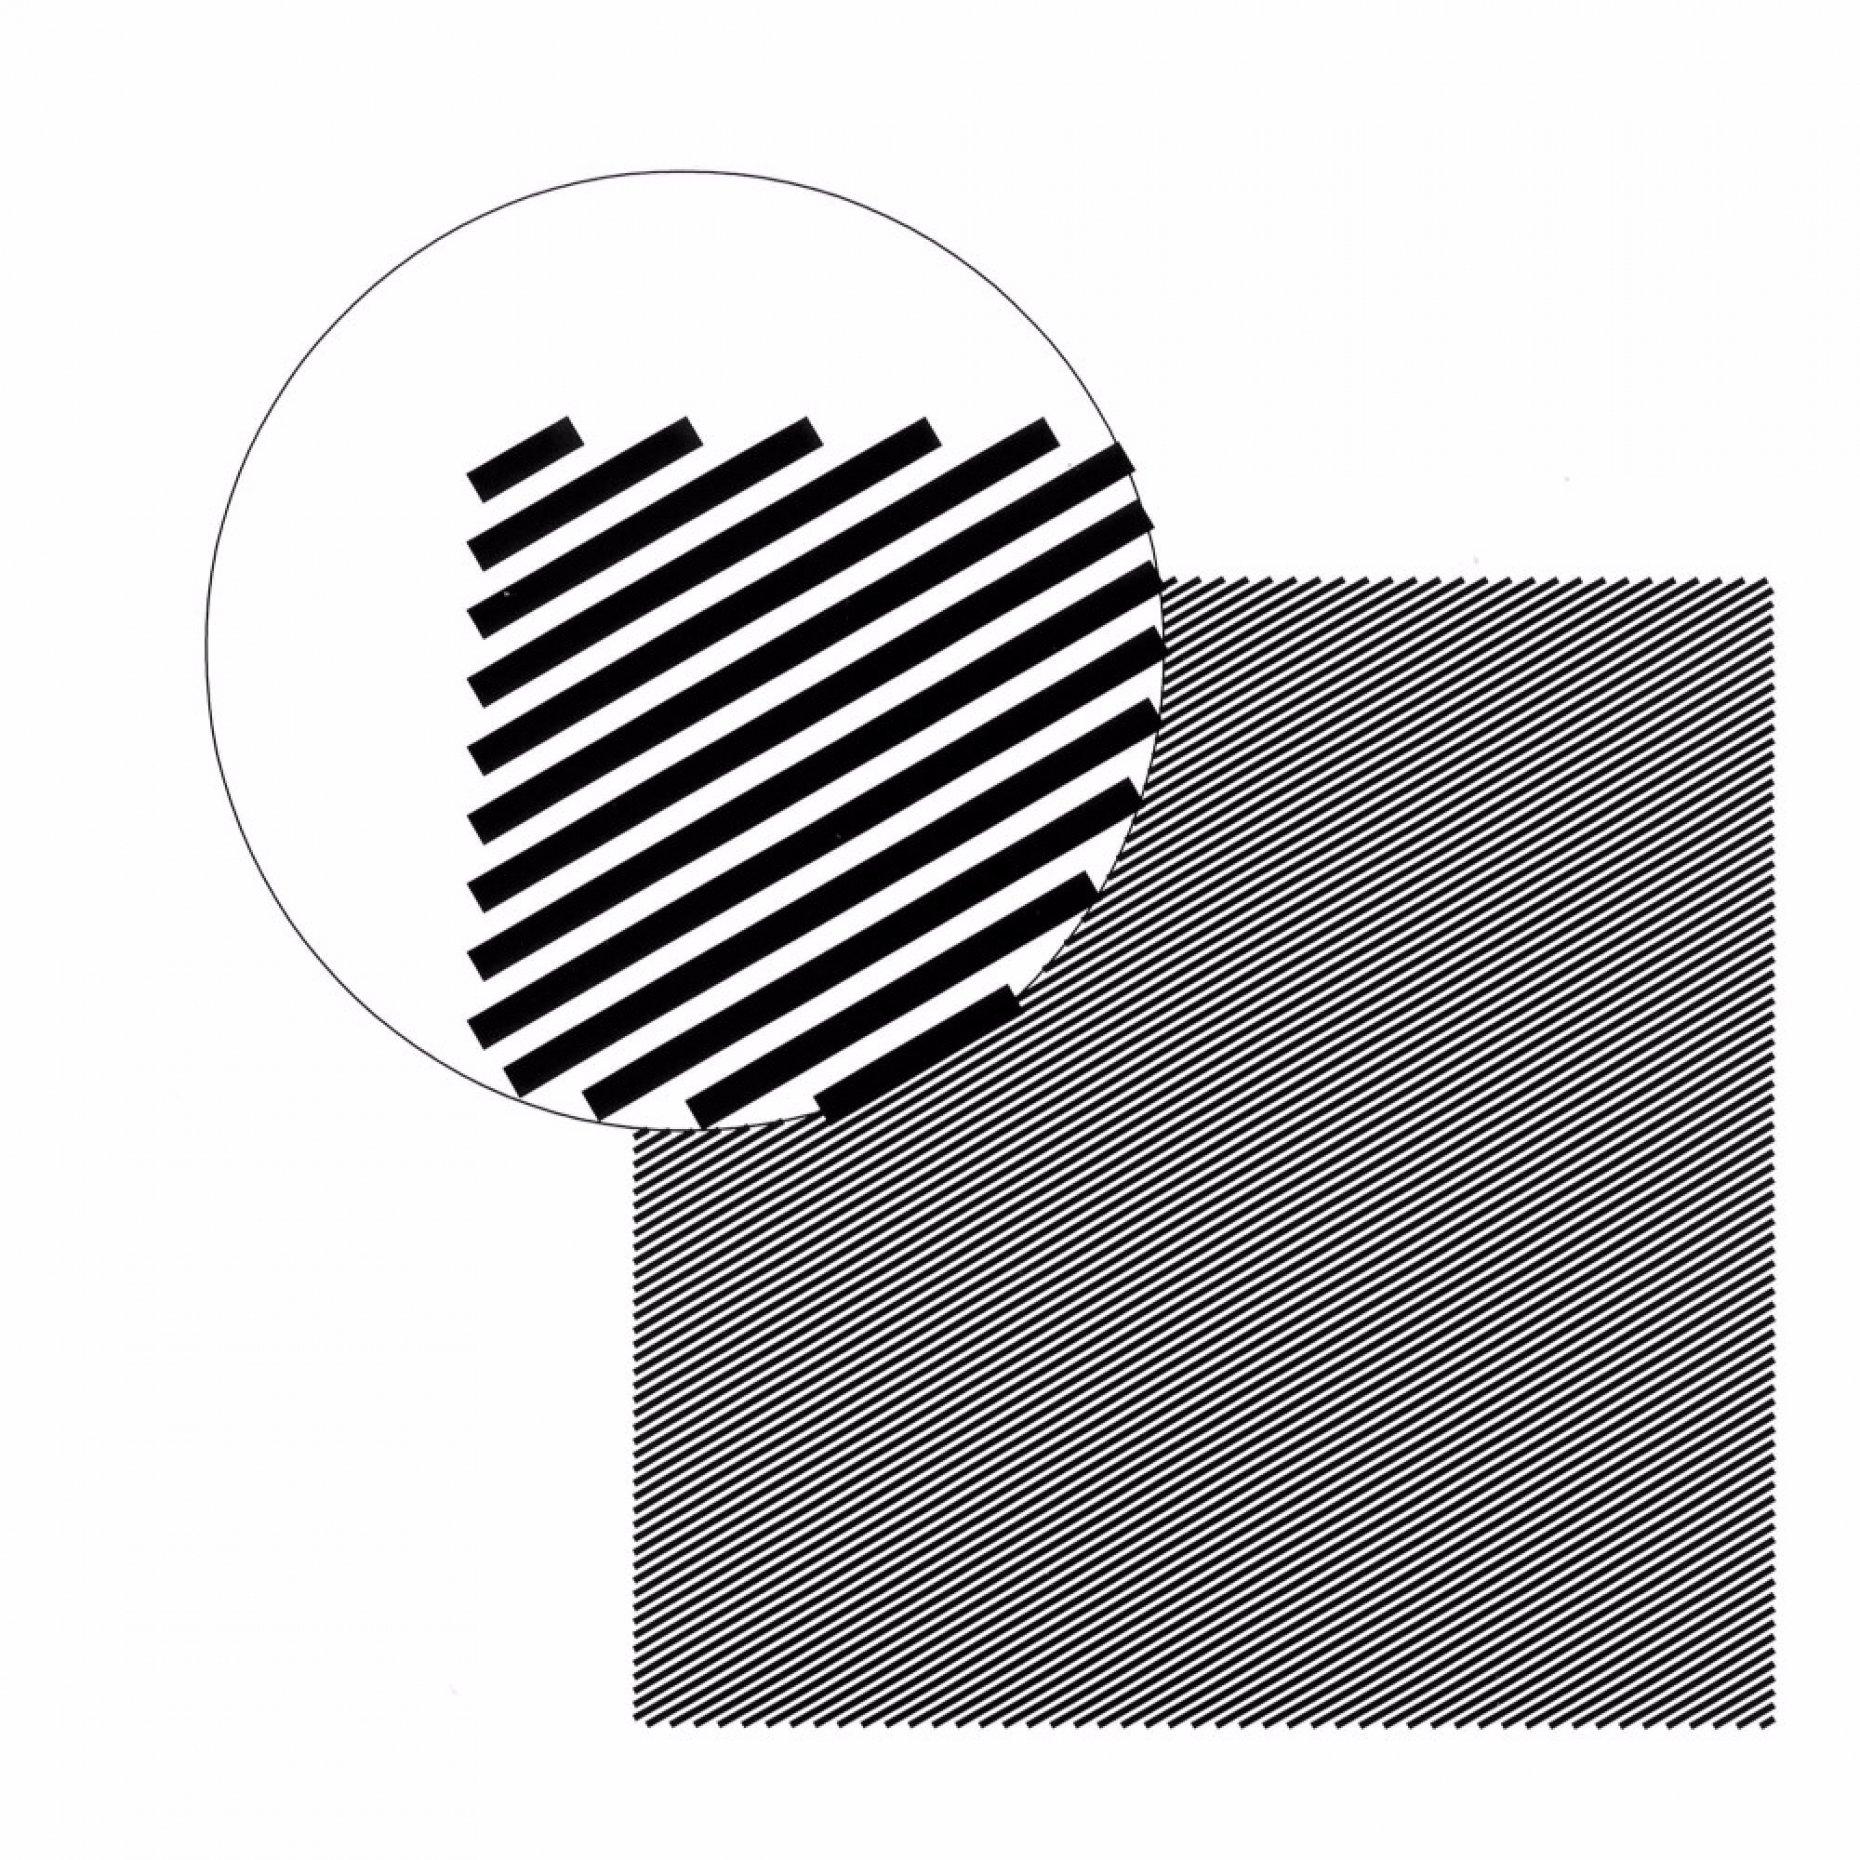 ATS05 30º 1.5mm Lines BS857:1967 Pattern